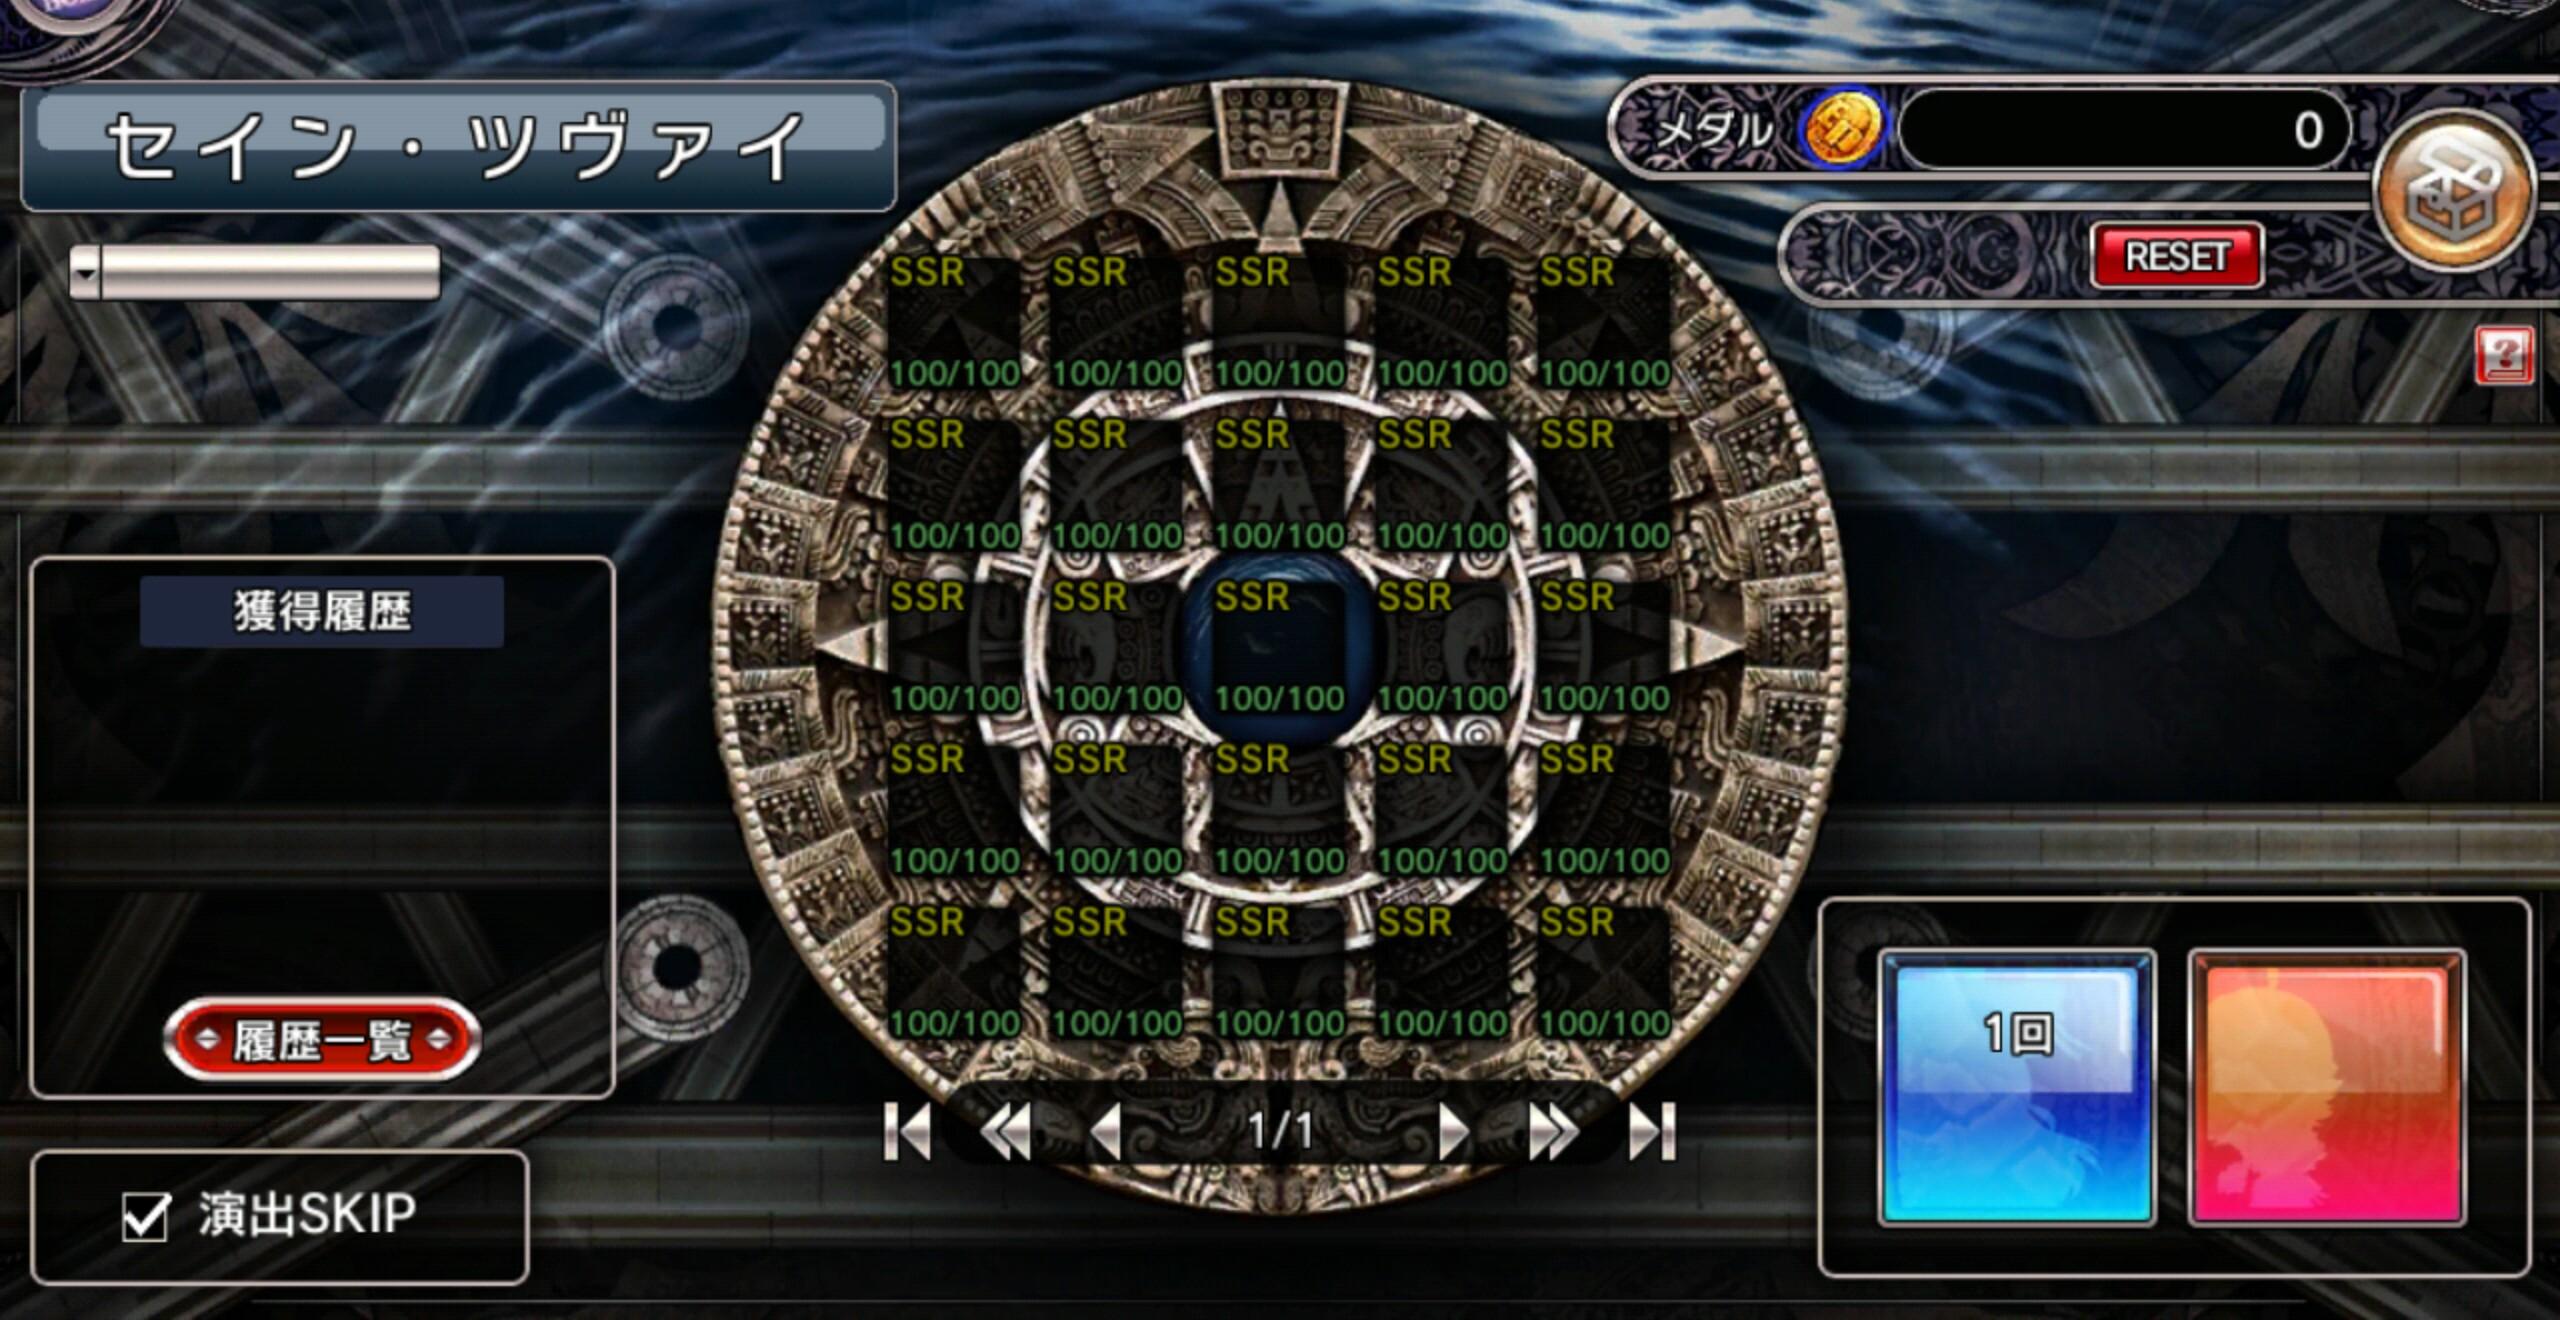 【DMM.R18】ブレイヴガール レイヴンズxR Part281 [無断転載禁止]©bbspink.com->画像>19枚